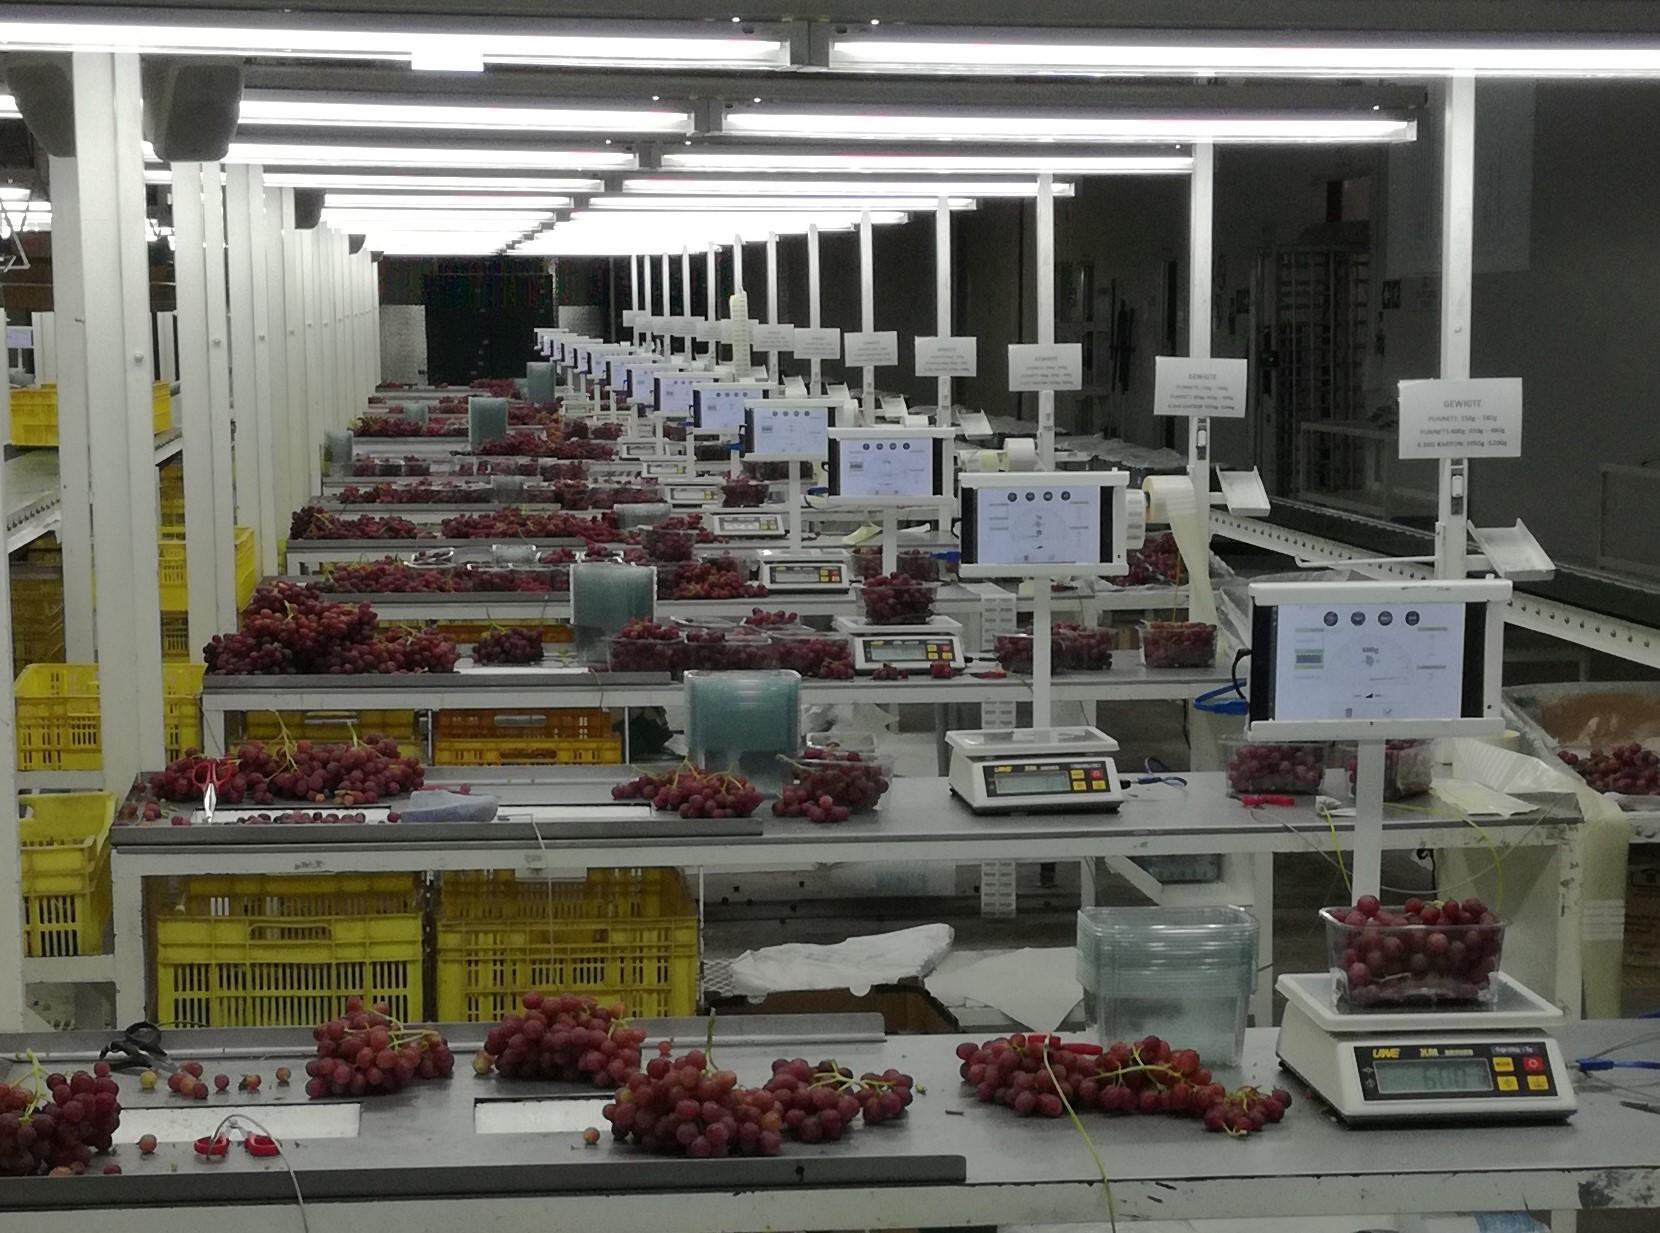 Vendutiekraal partner with Paltrack on Grape Packhouse Solution